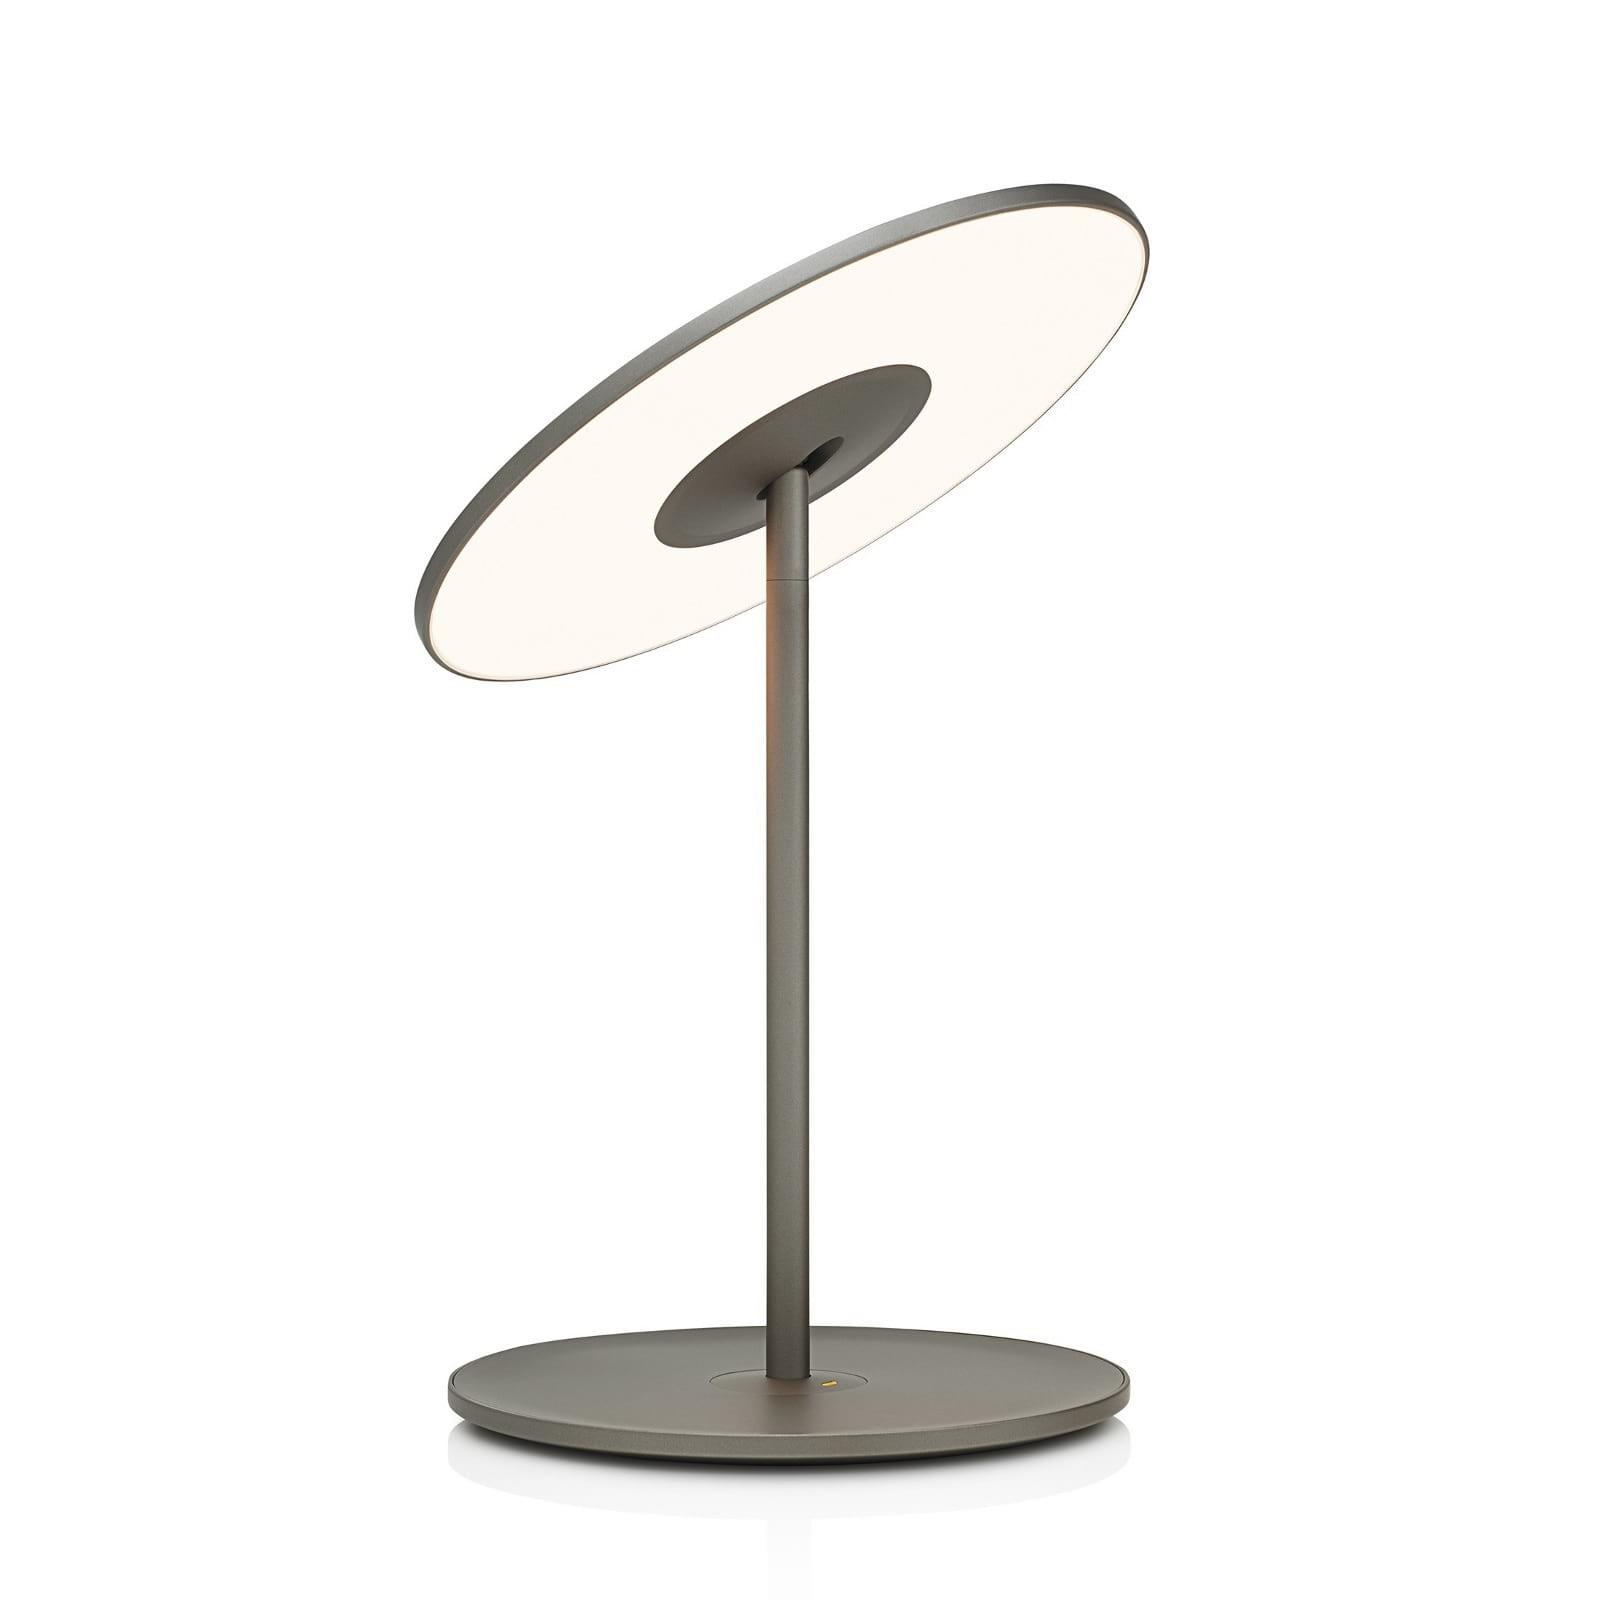 Circa Flat Panel LED Table Lamp (Graphite) - Pablo Designs